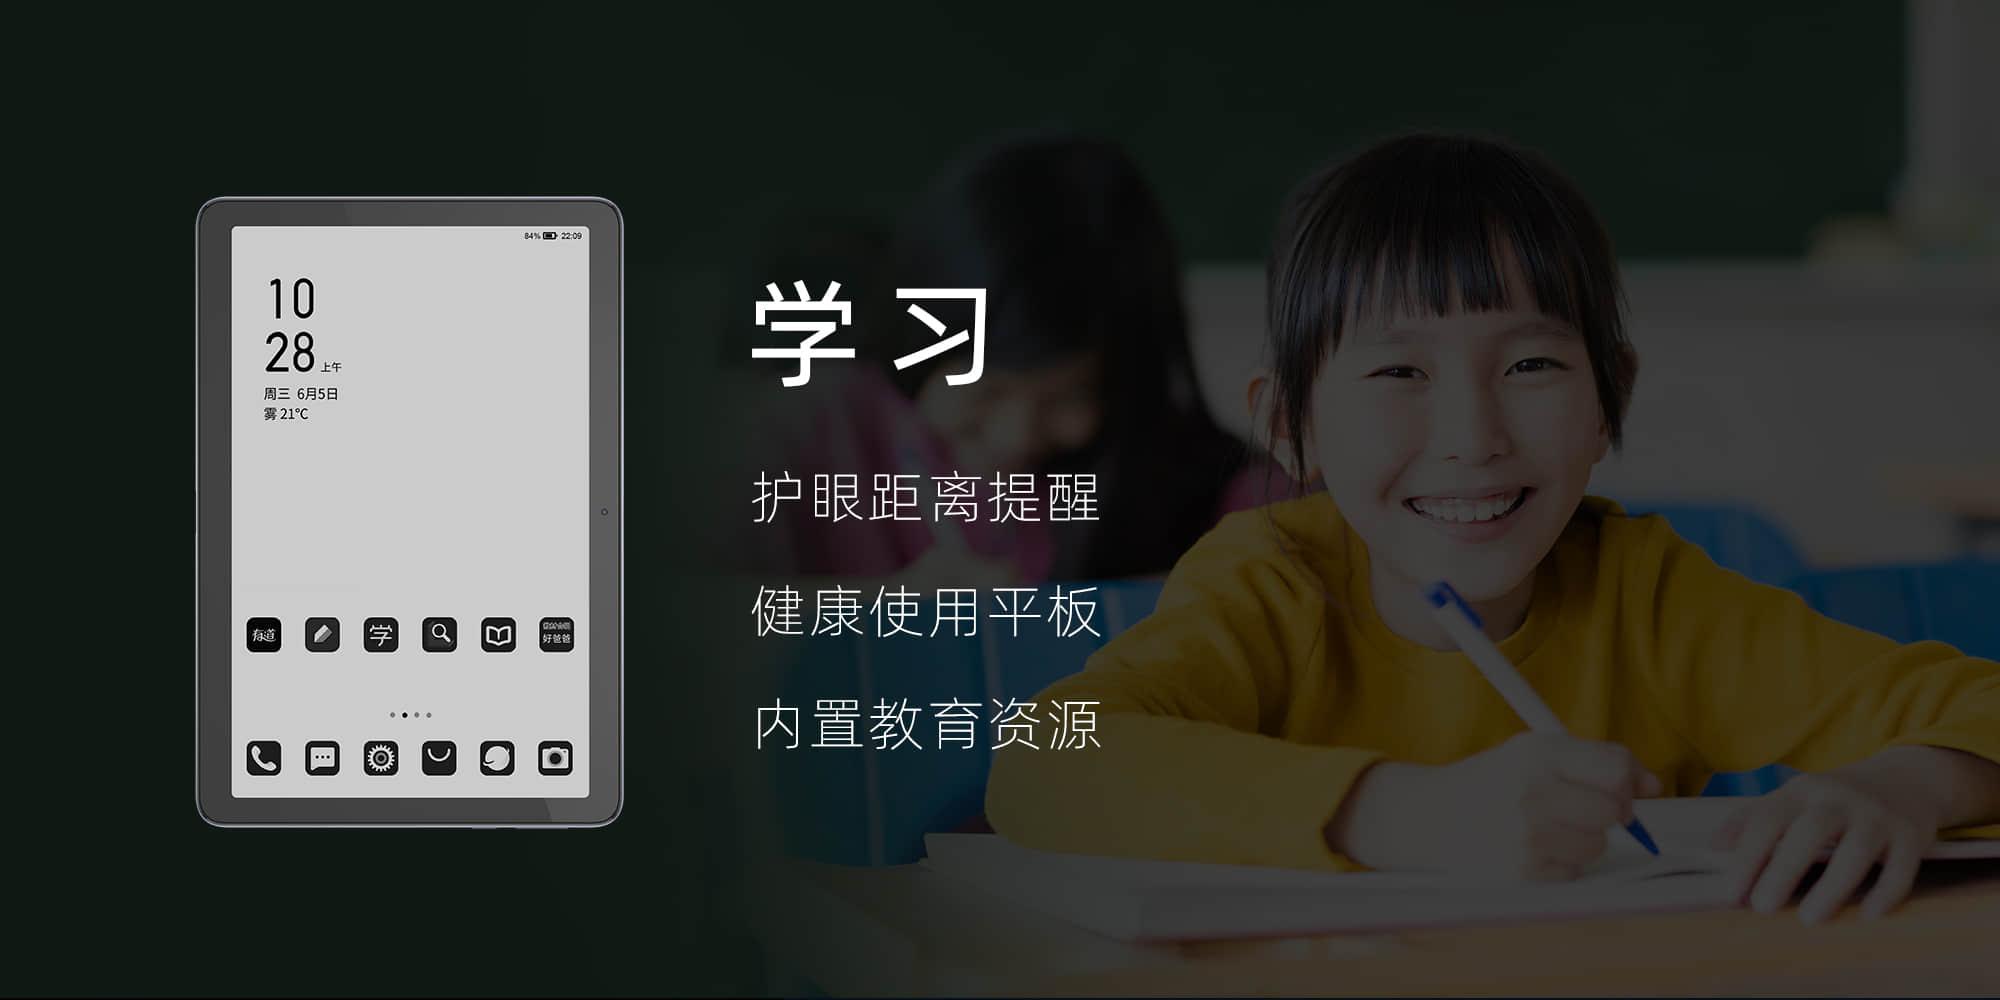 C:\Users\guojinhua1\Desktop\PPT-2\19.jpg19